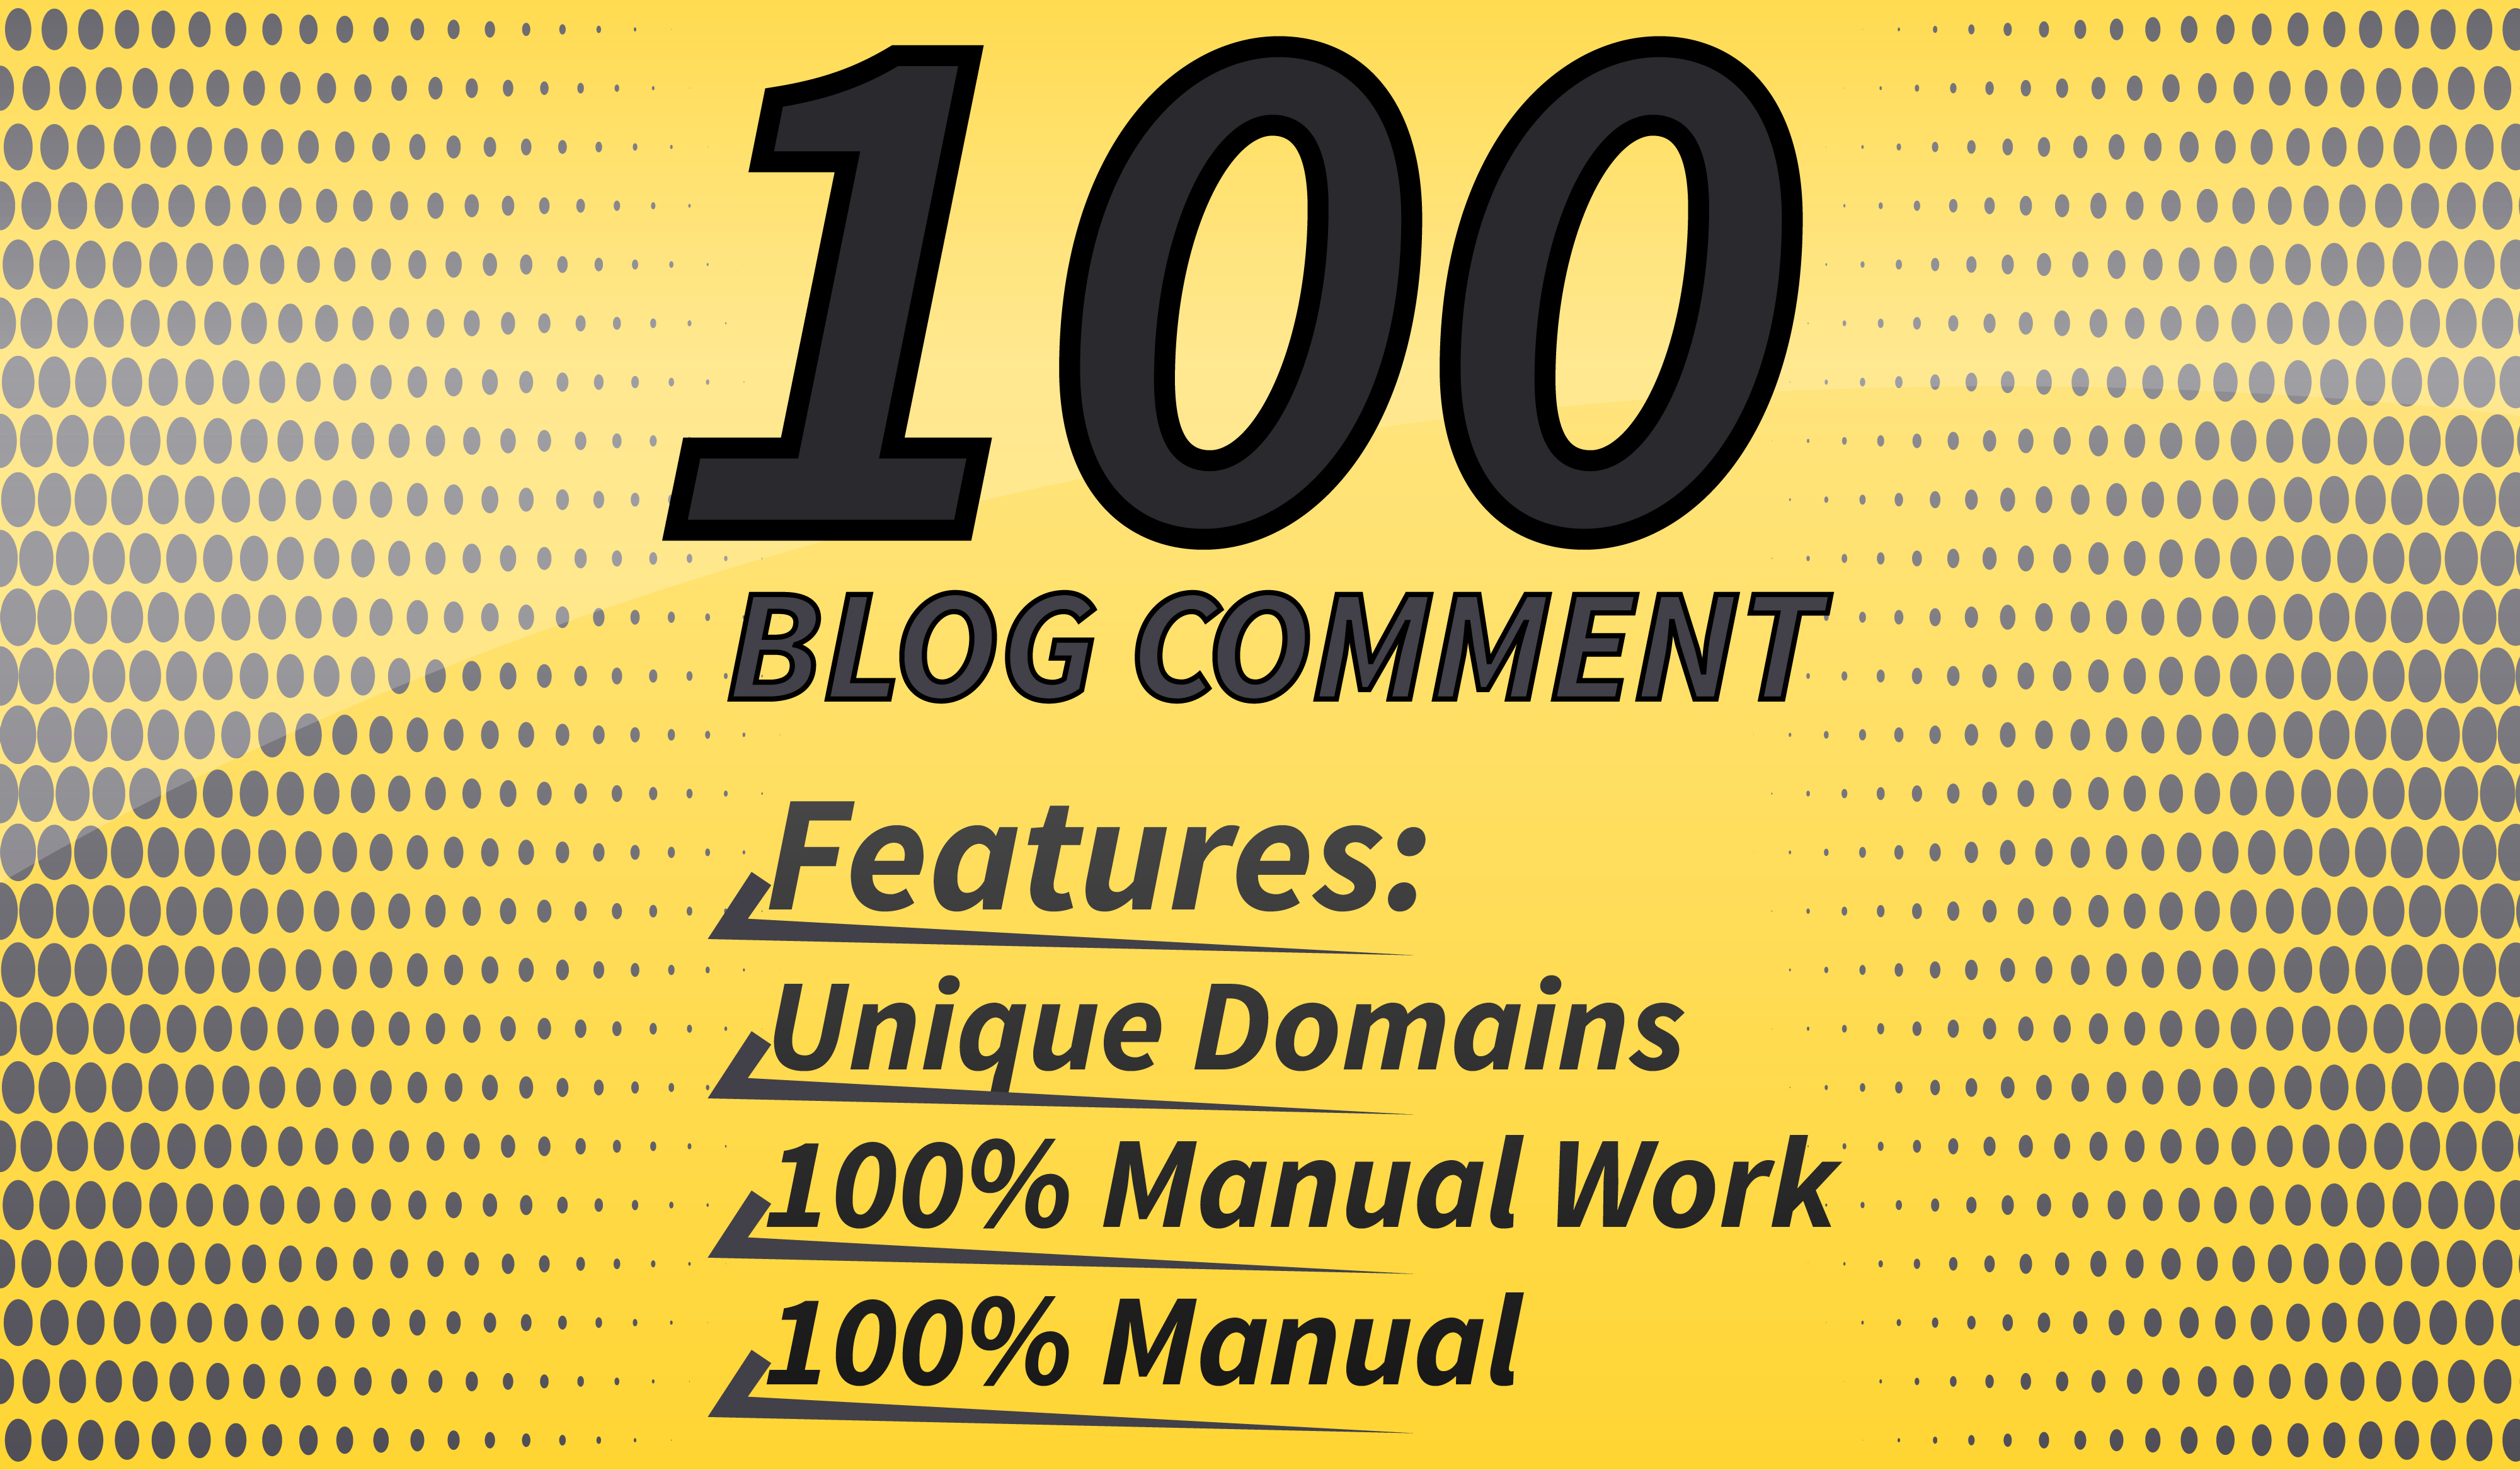 I will do 100 do-follow Blog comment backlinks.